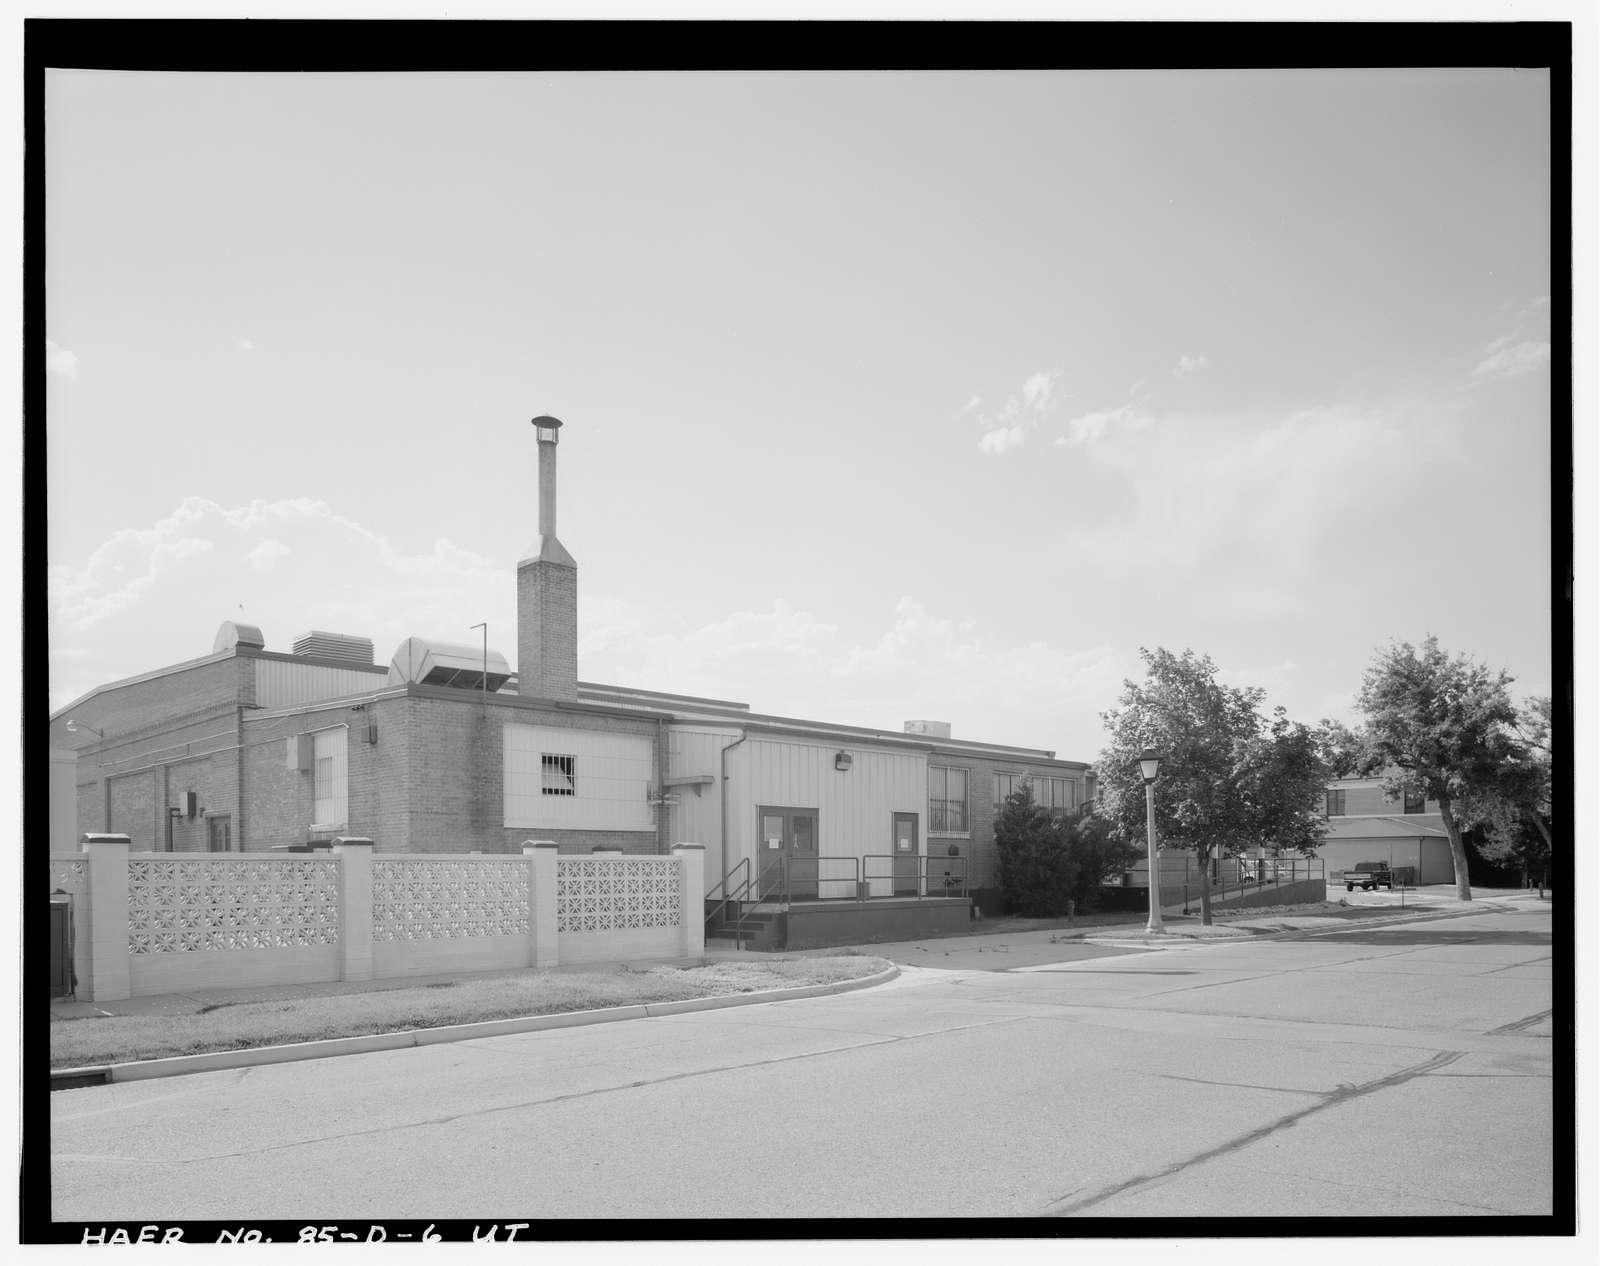 Hill Field, Aircraft Paint, Oil & Dope House, 5923 C Avenue, Layton, Davis County, UT